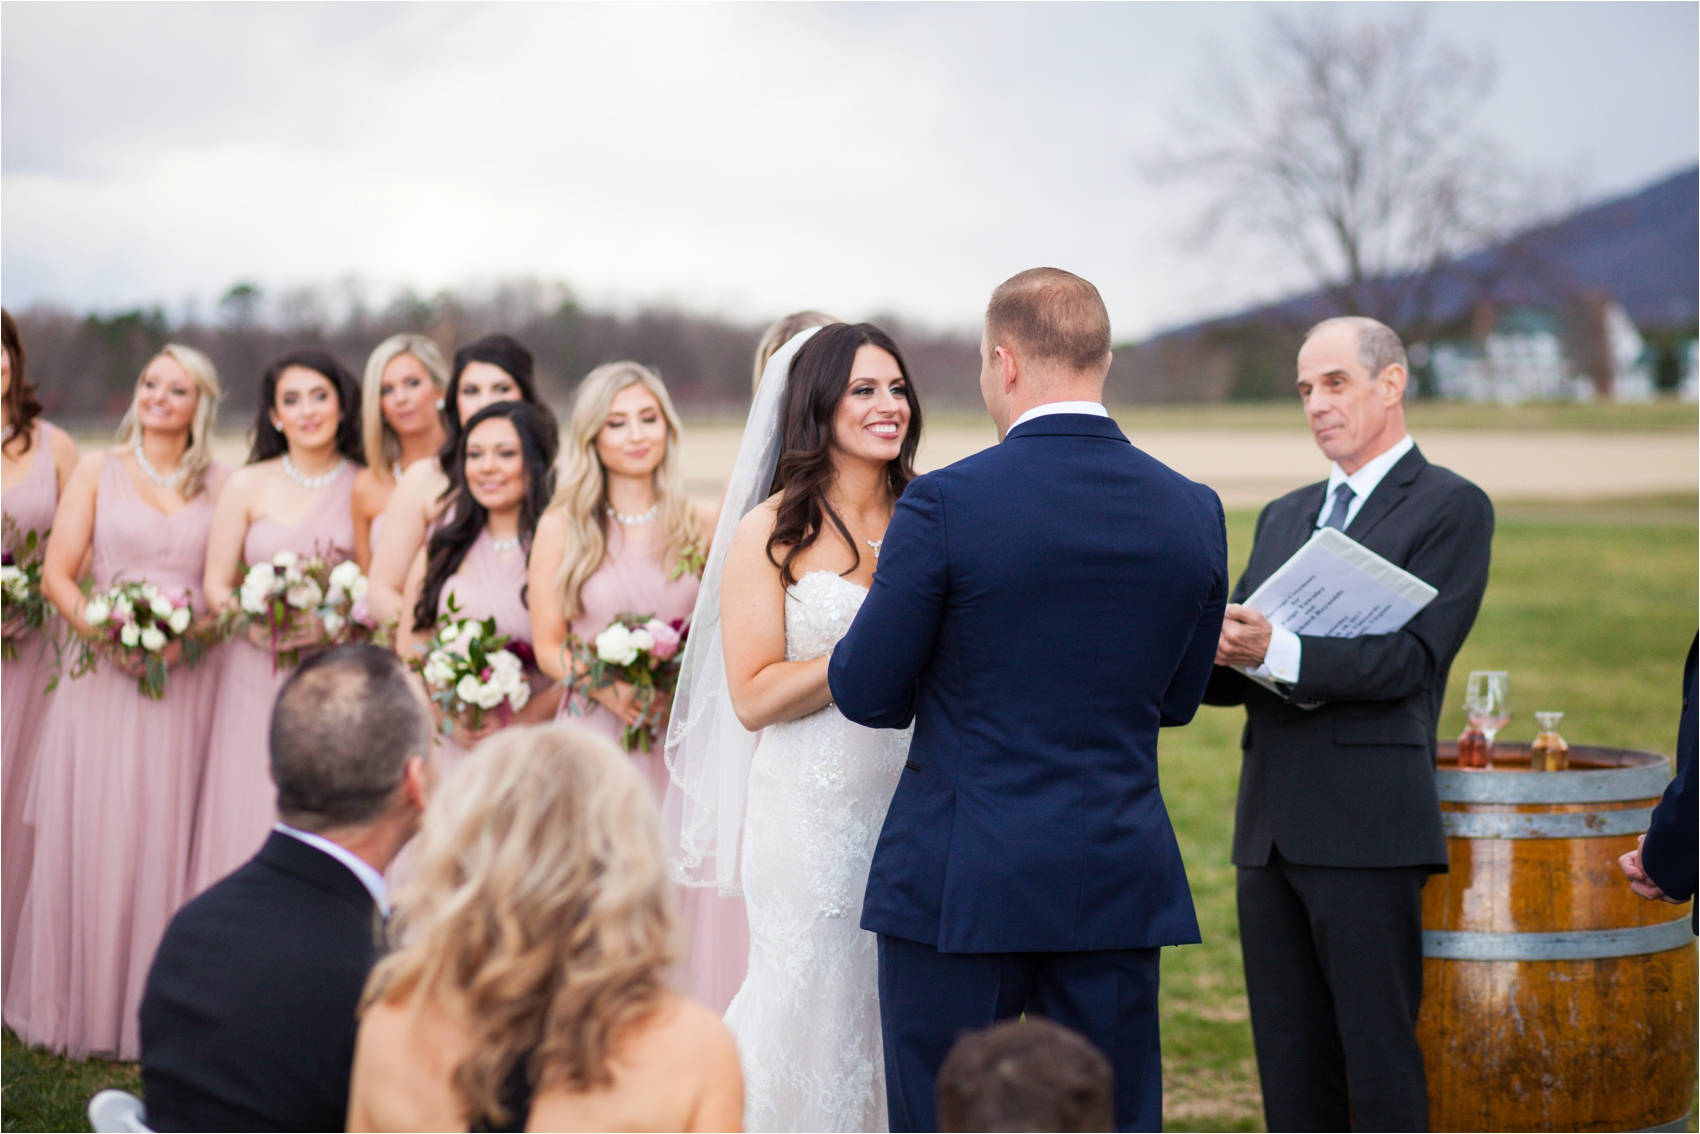 King-Family-Vineyard-Spring-Virginia-Wedding-1607.jpg